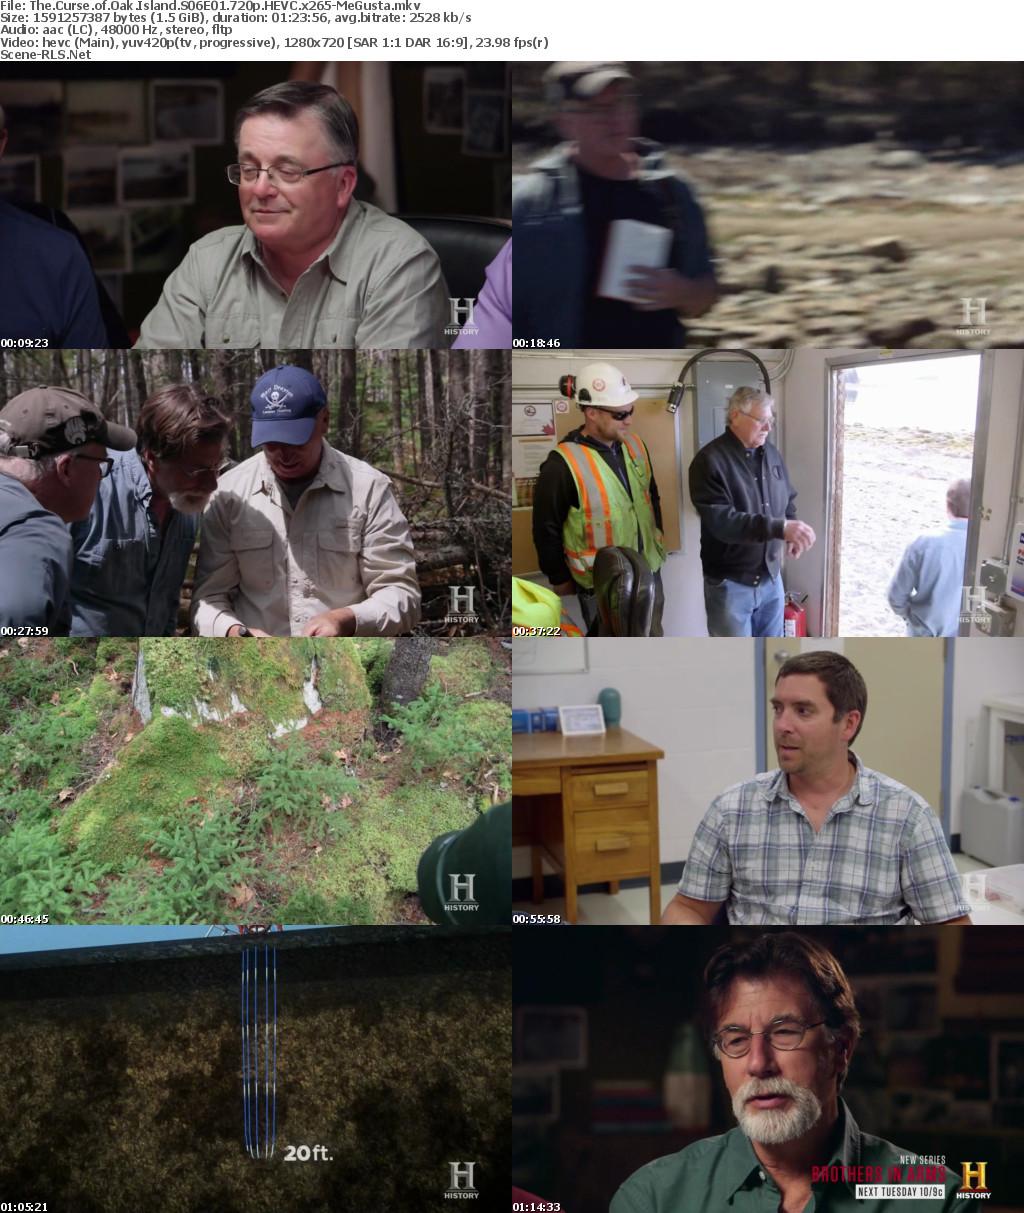 curse of oak island season 5 episode 2 openload